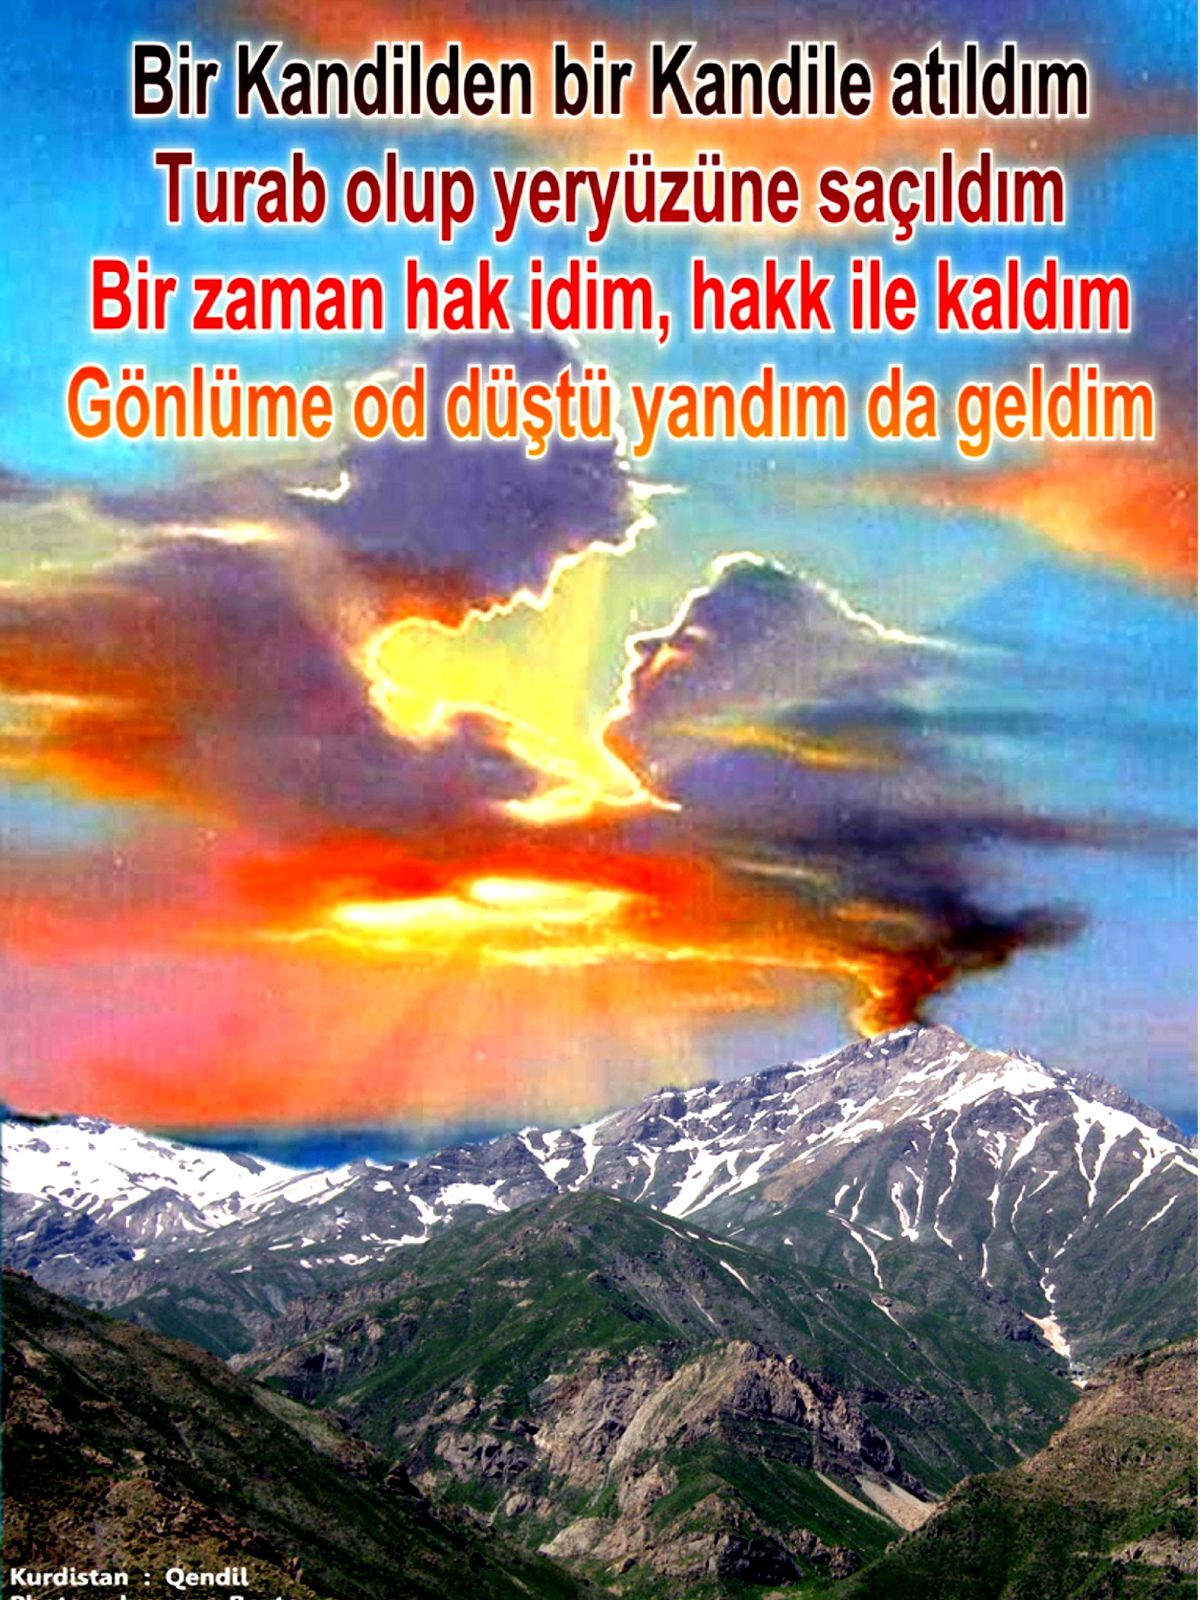 Devrimci Aleviler Birliği DAB Alevi Kızılbaş Bektaşi pir sultan cem hz Ali 12 imam semah Feramuz Şah Acar Kandillll